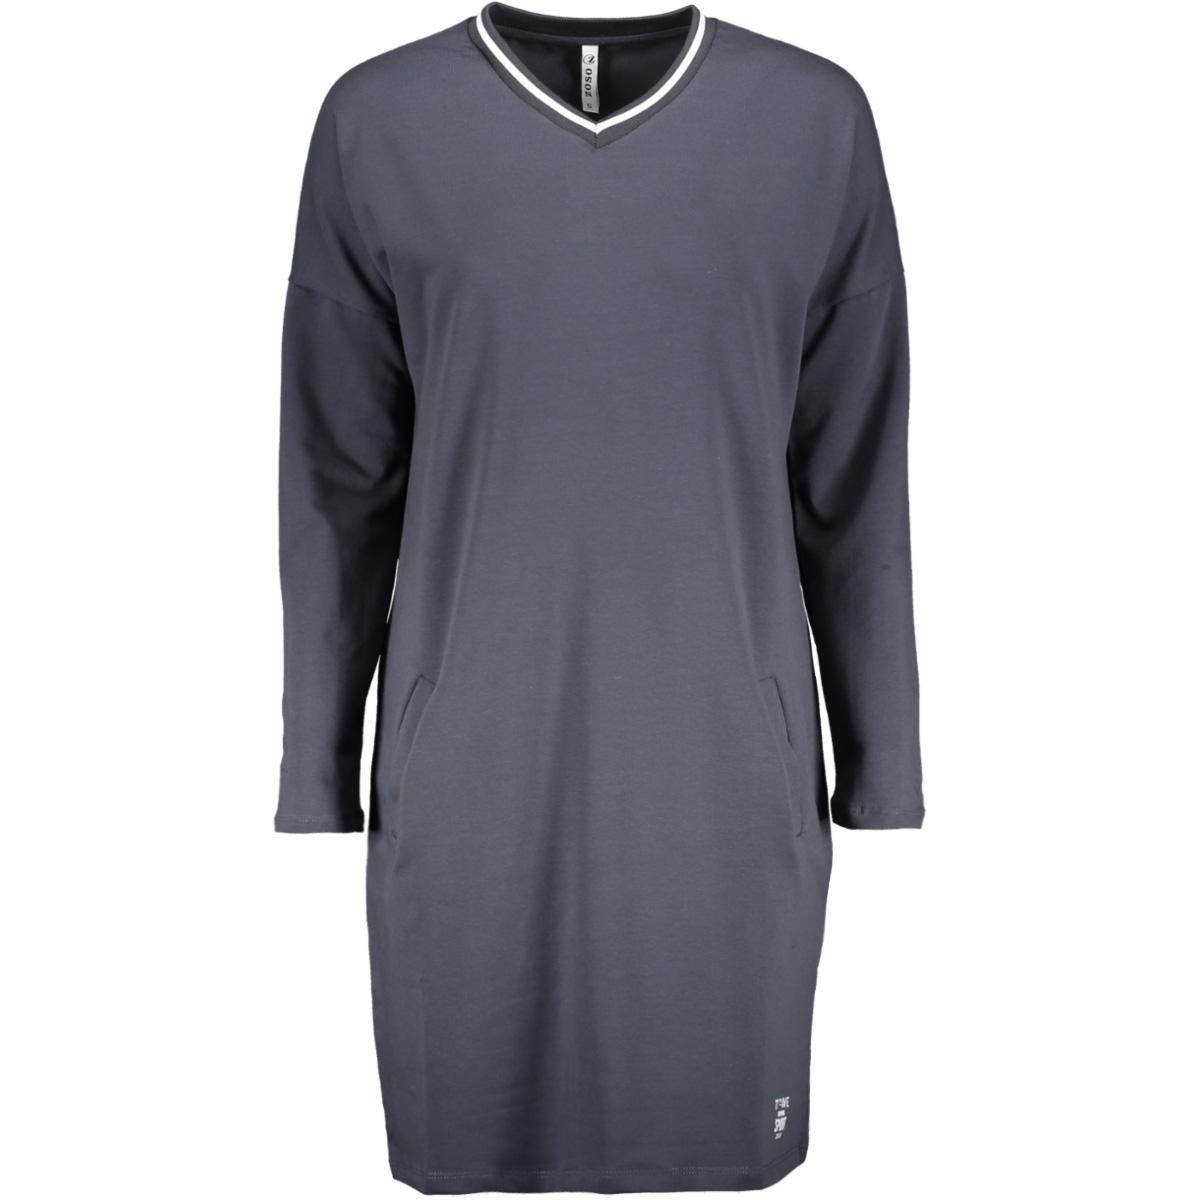 jaim tunic dress zoso jurk antra/off white